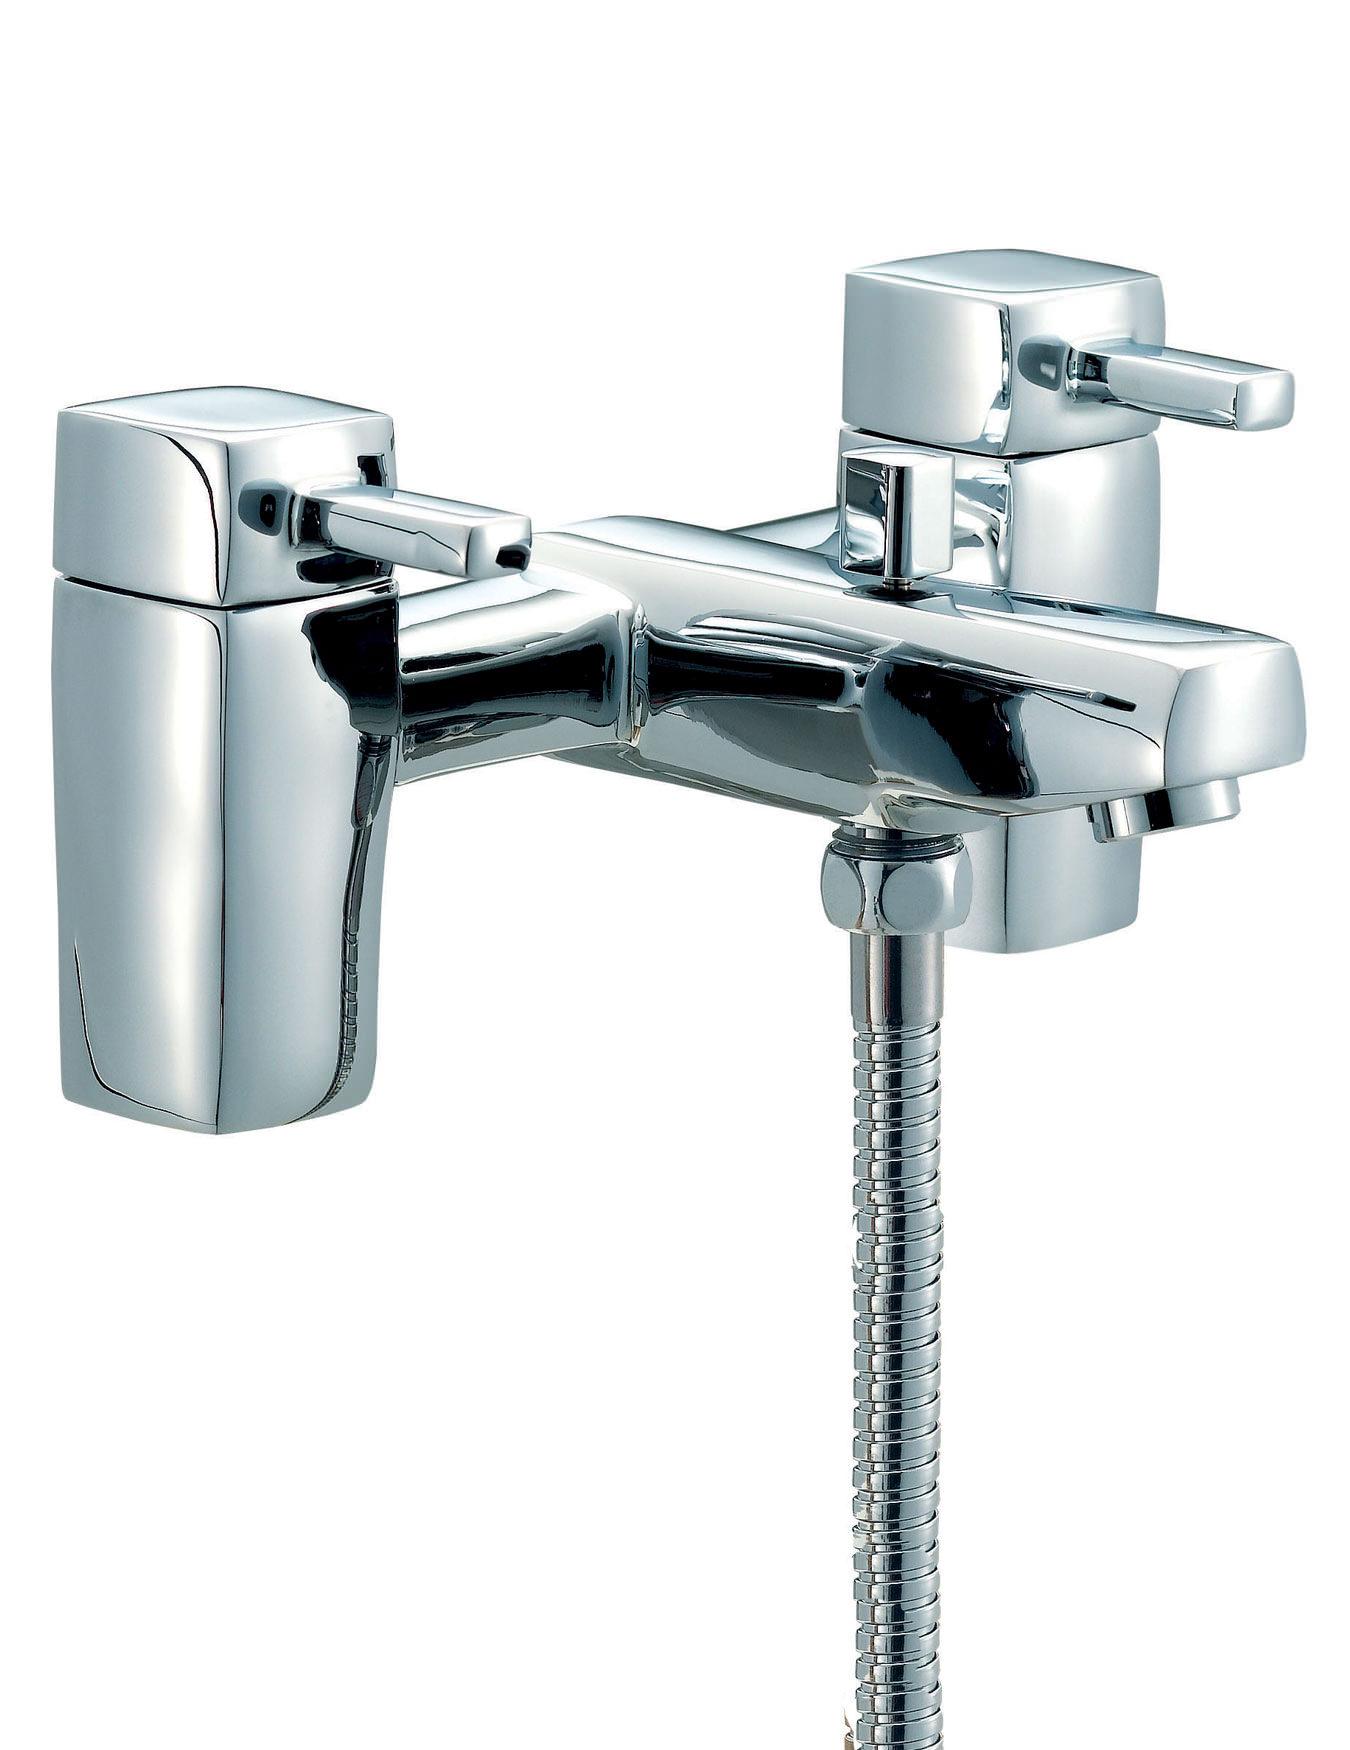 Bath Taps: Mayfair QL Bath Shower Mixer Tap With Shower Kit Chrome